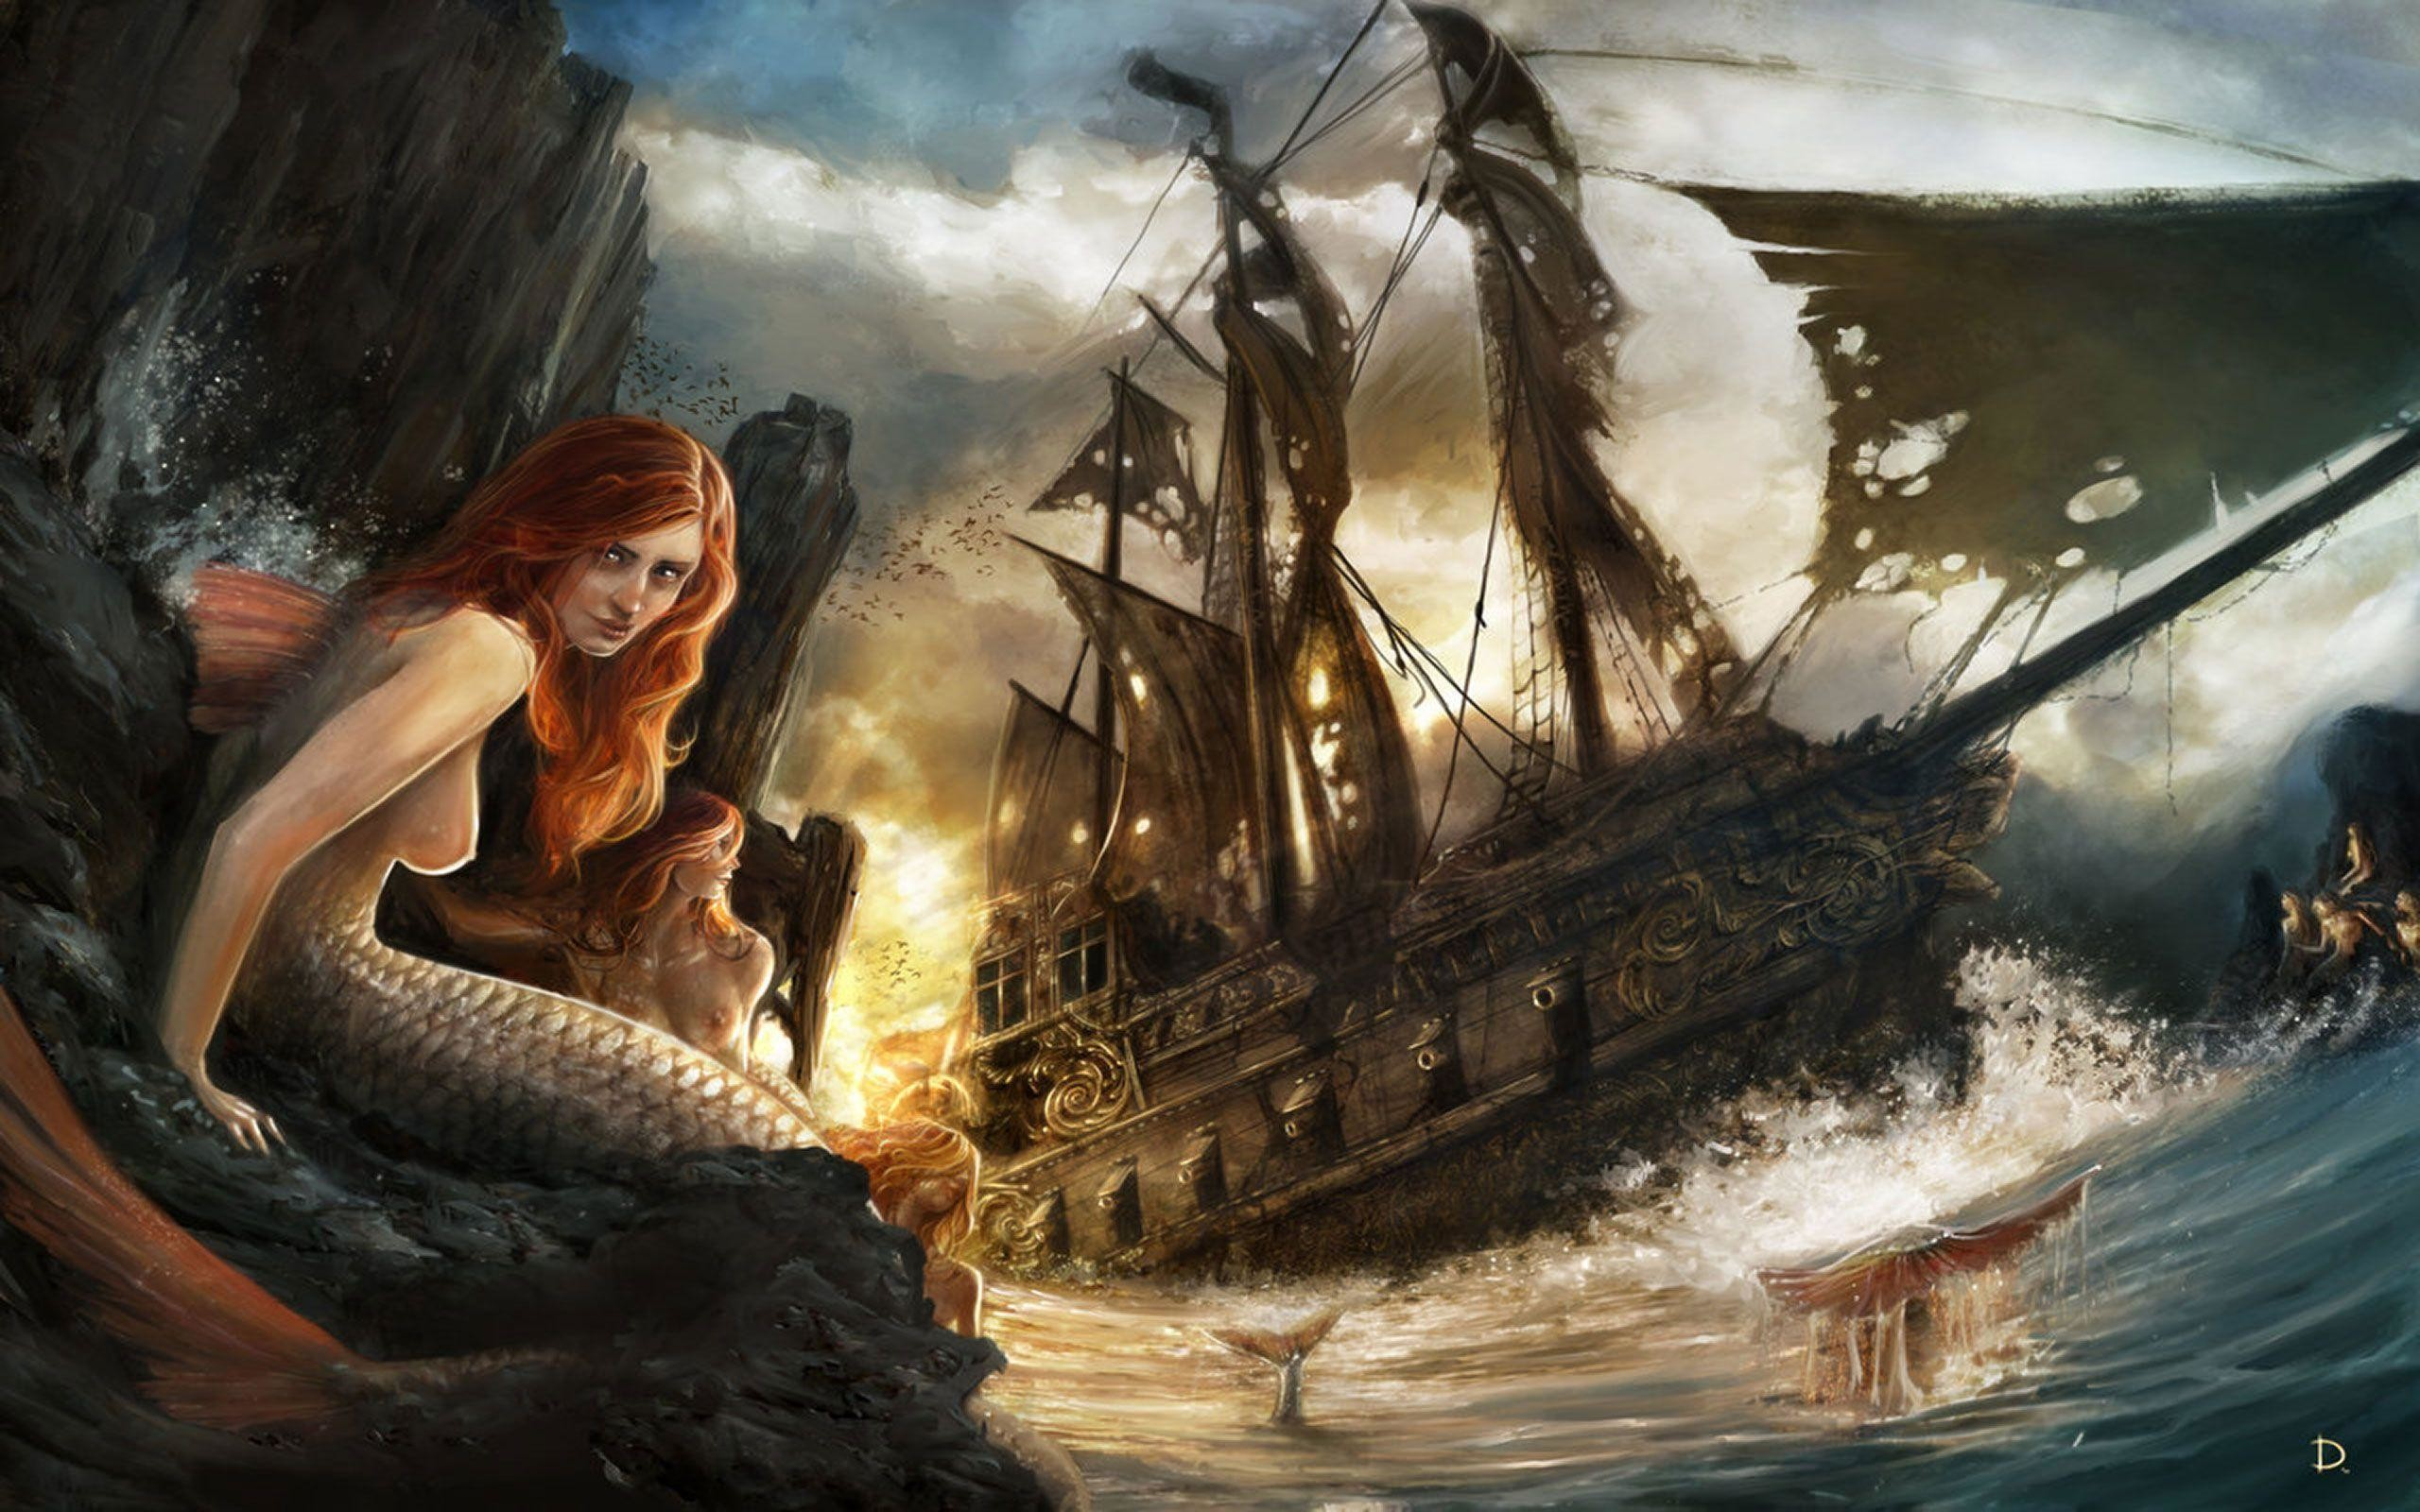 Free Wallpapers – Mermaids And Sinking Ship wallpaper